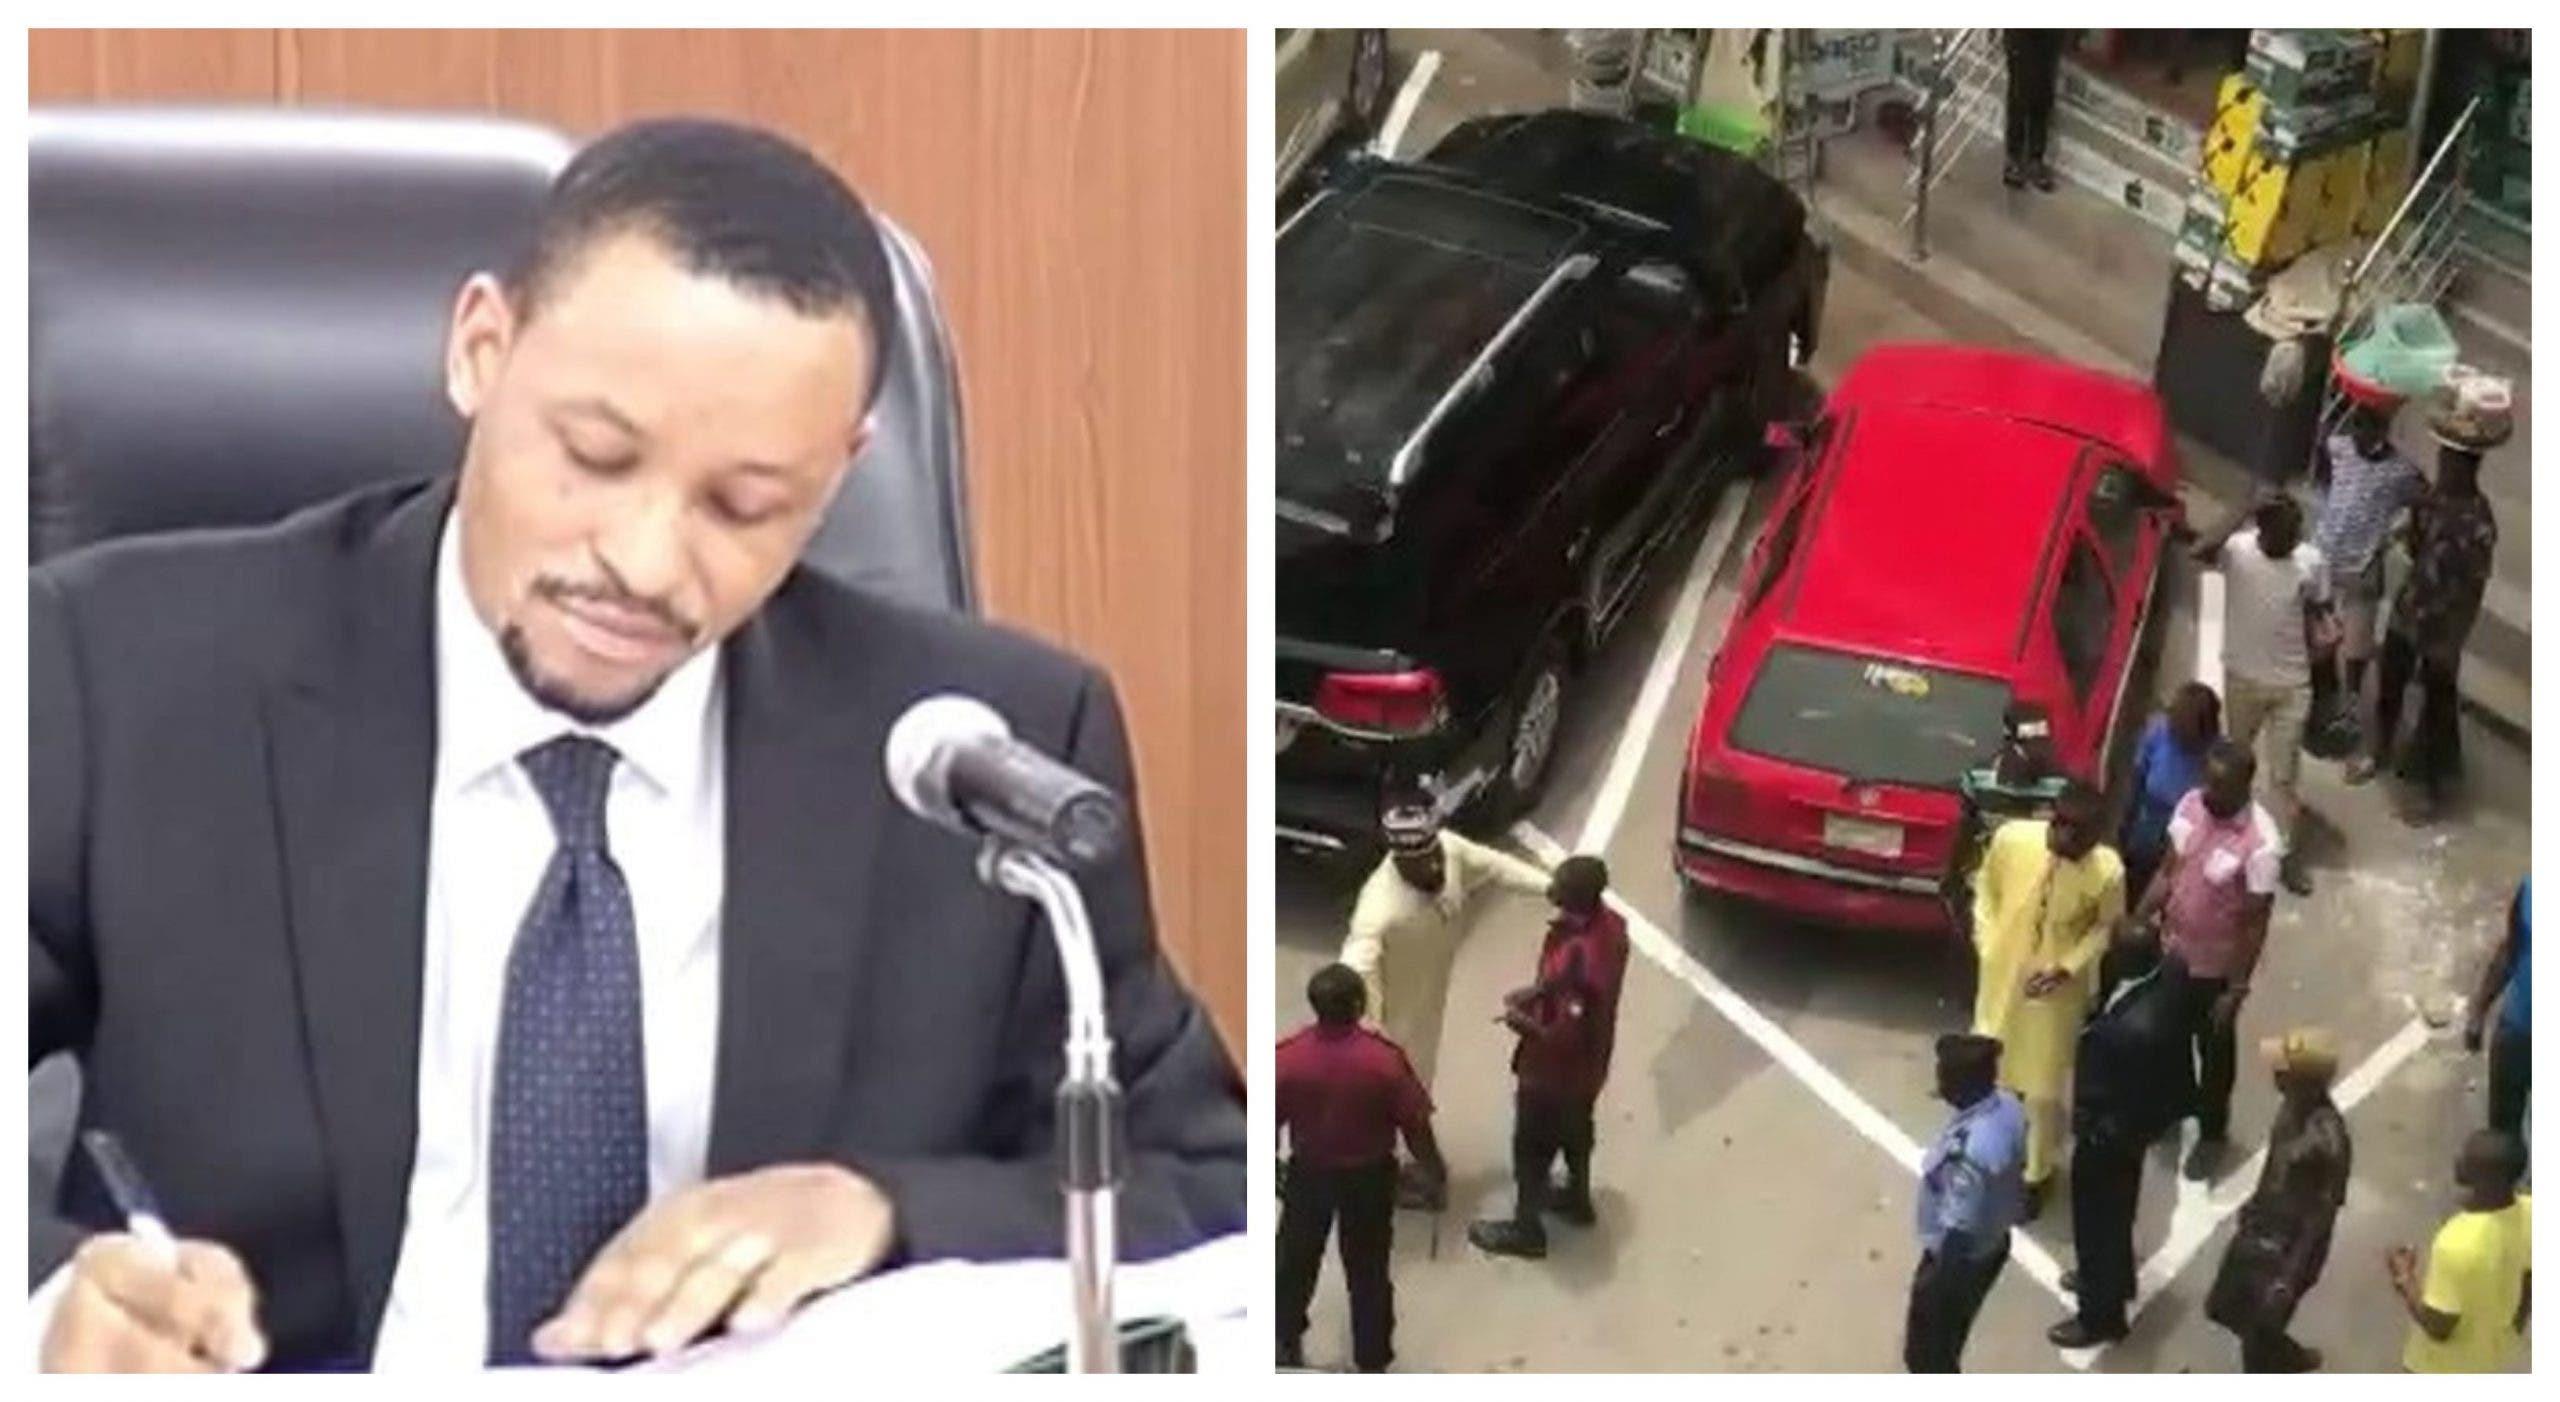 Nigerian Bar Association to investigate assault scandal involving CCT Chairman